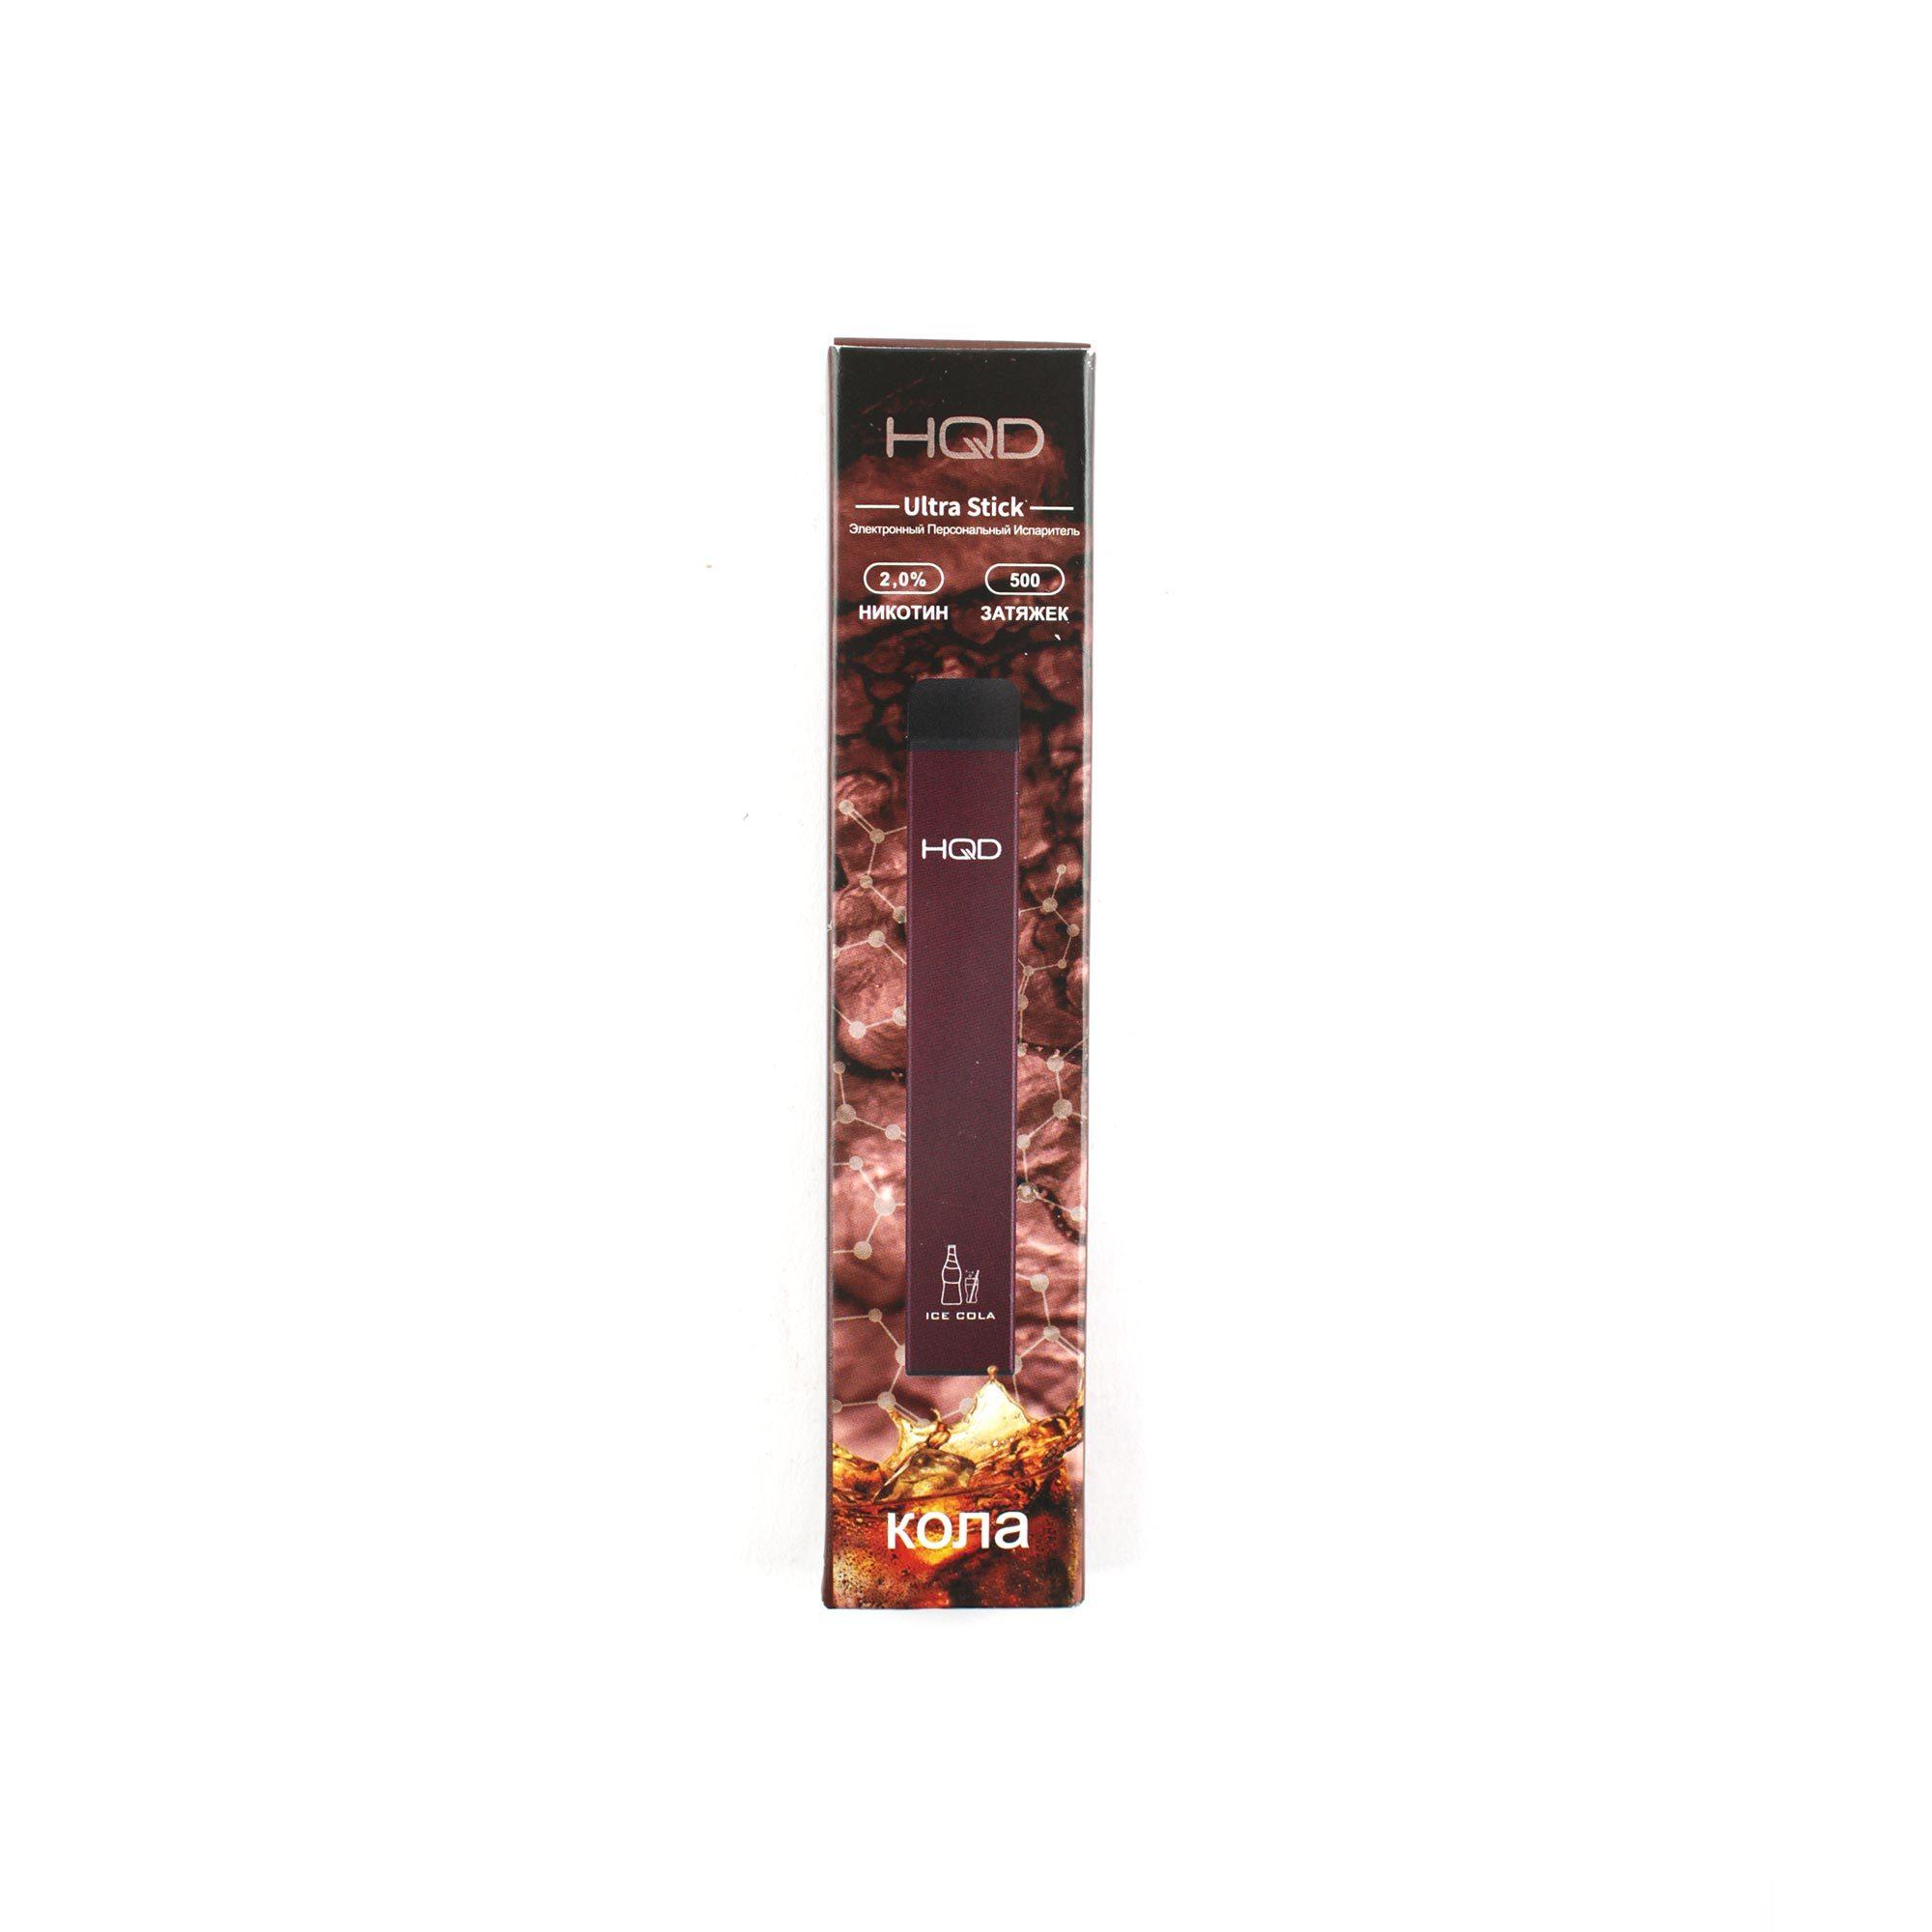 Одноразовая электронная сигарета HQD Ultra Cola (Кола)